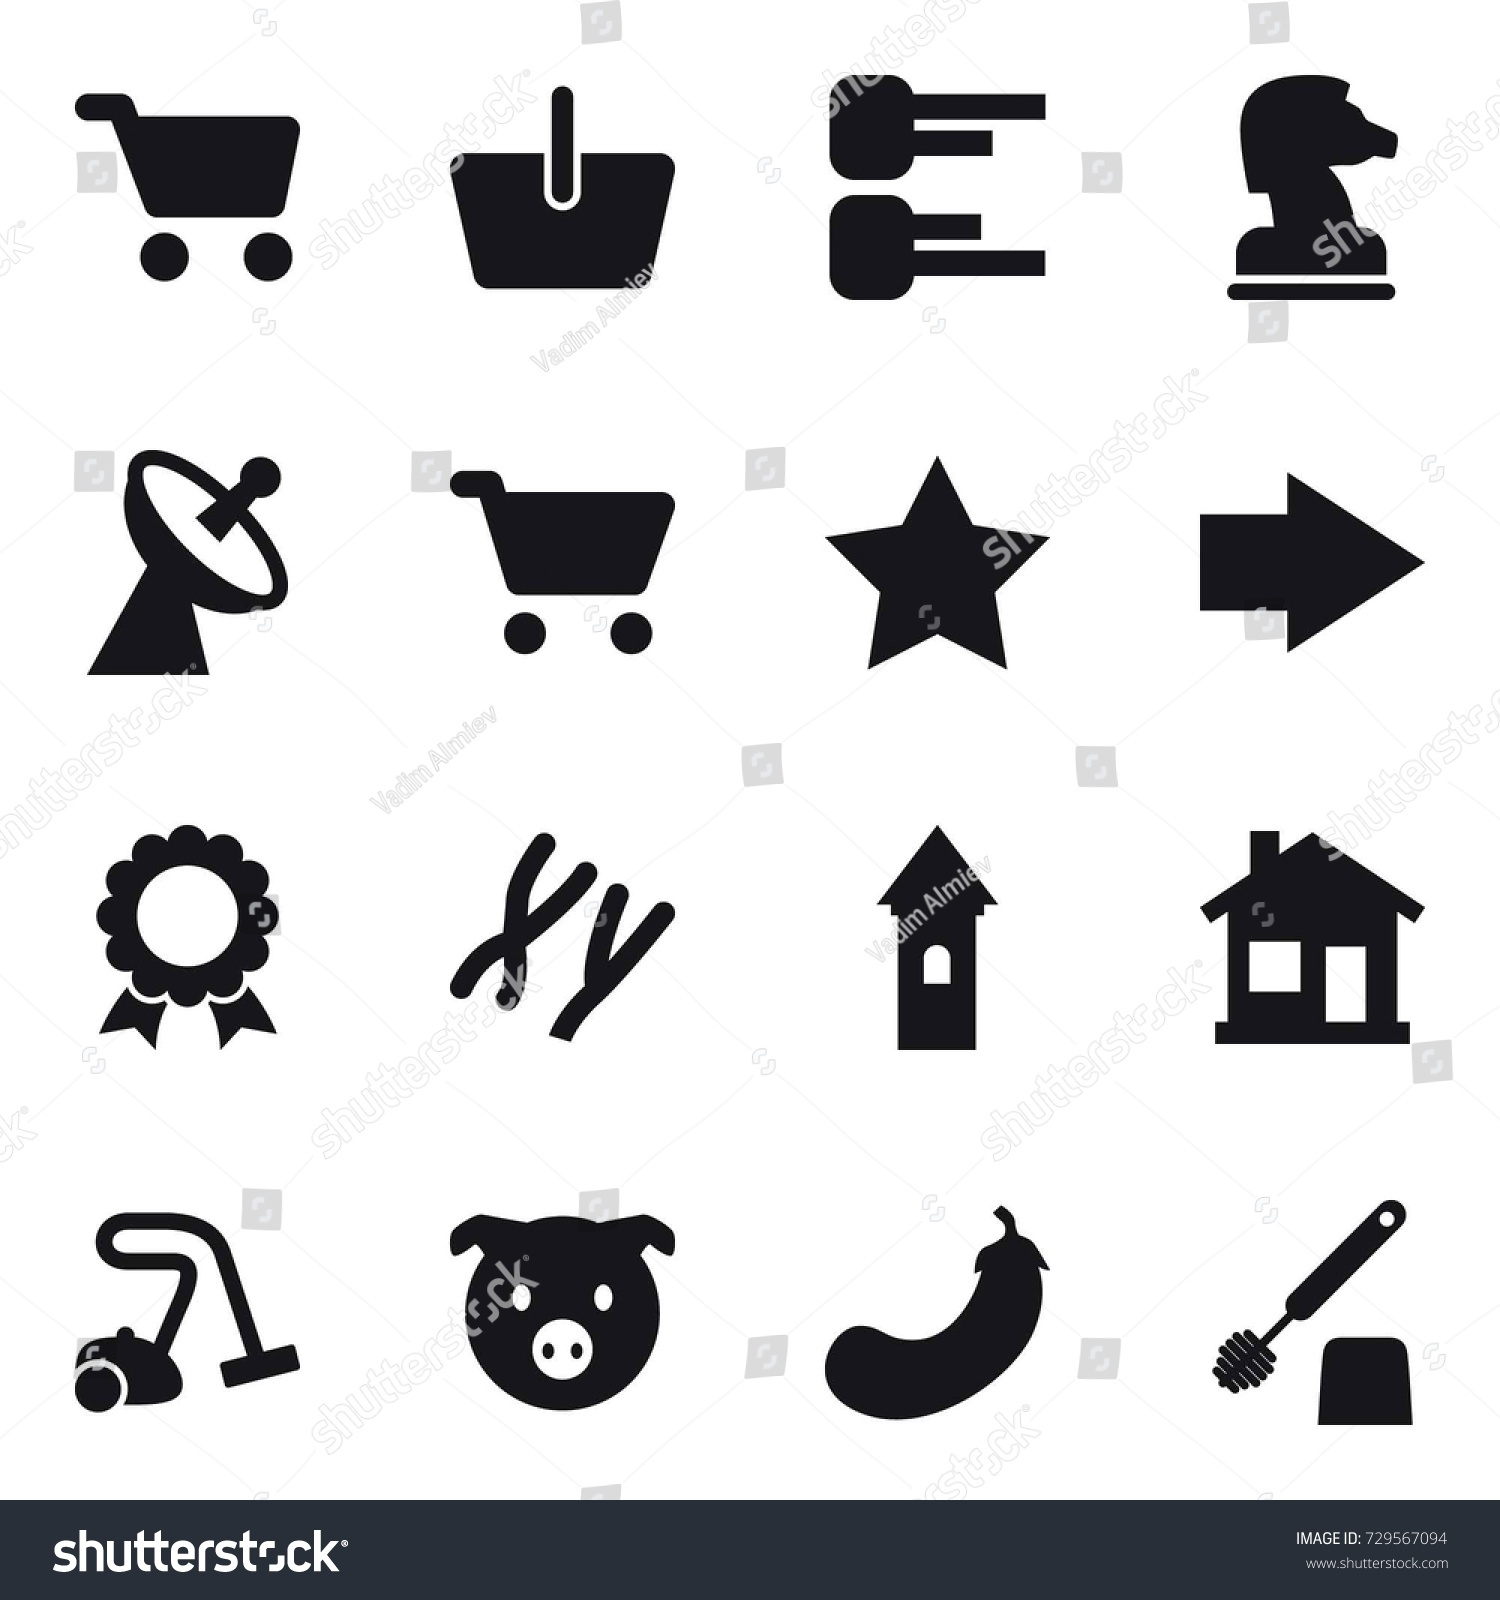 hight resolution of 16 vector icon set cart basket diagram chess horse satellite antenna